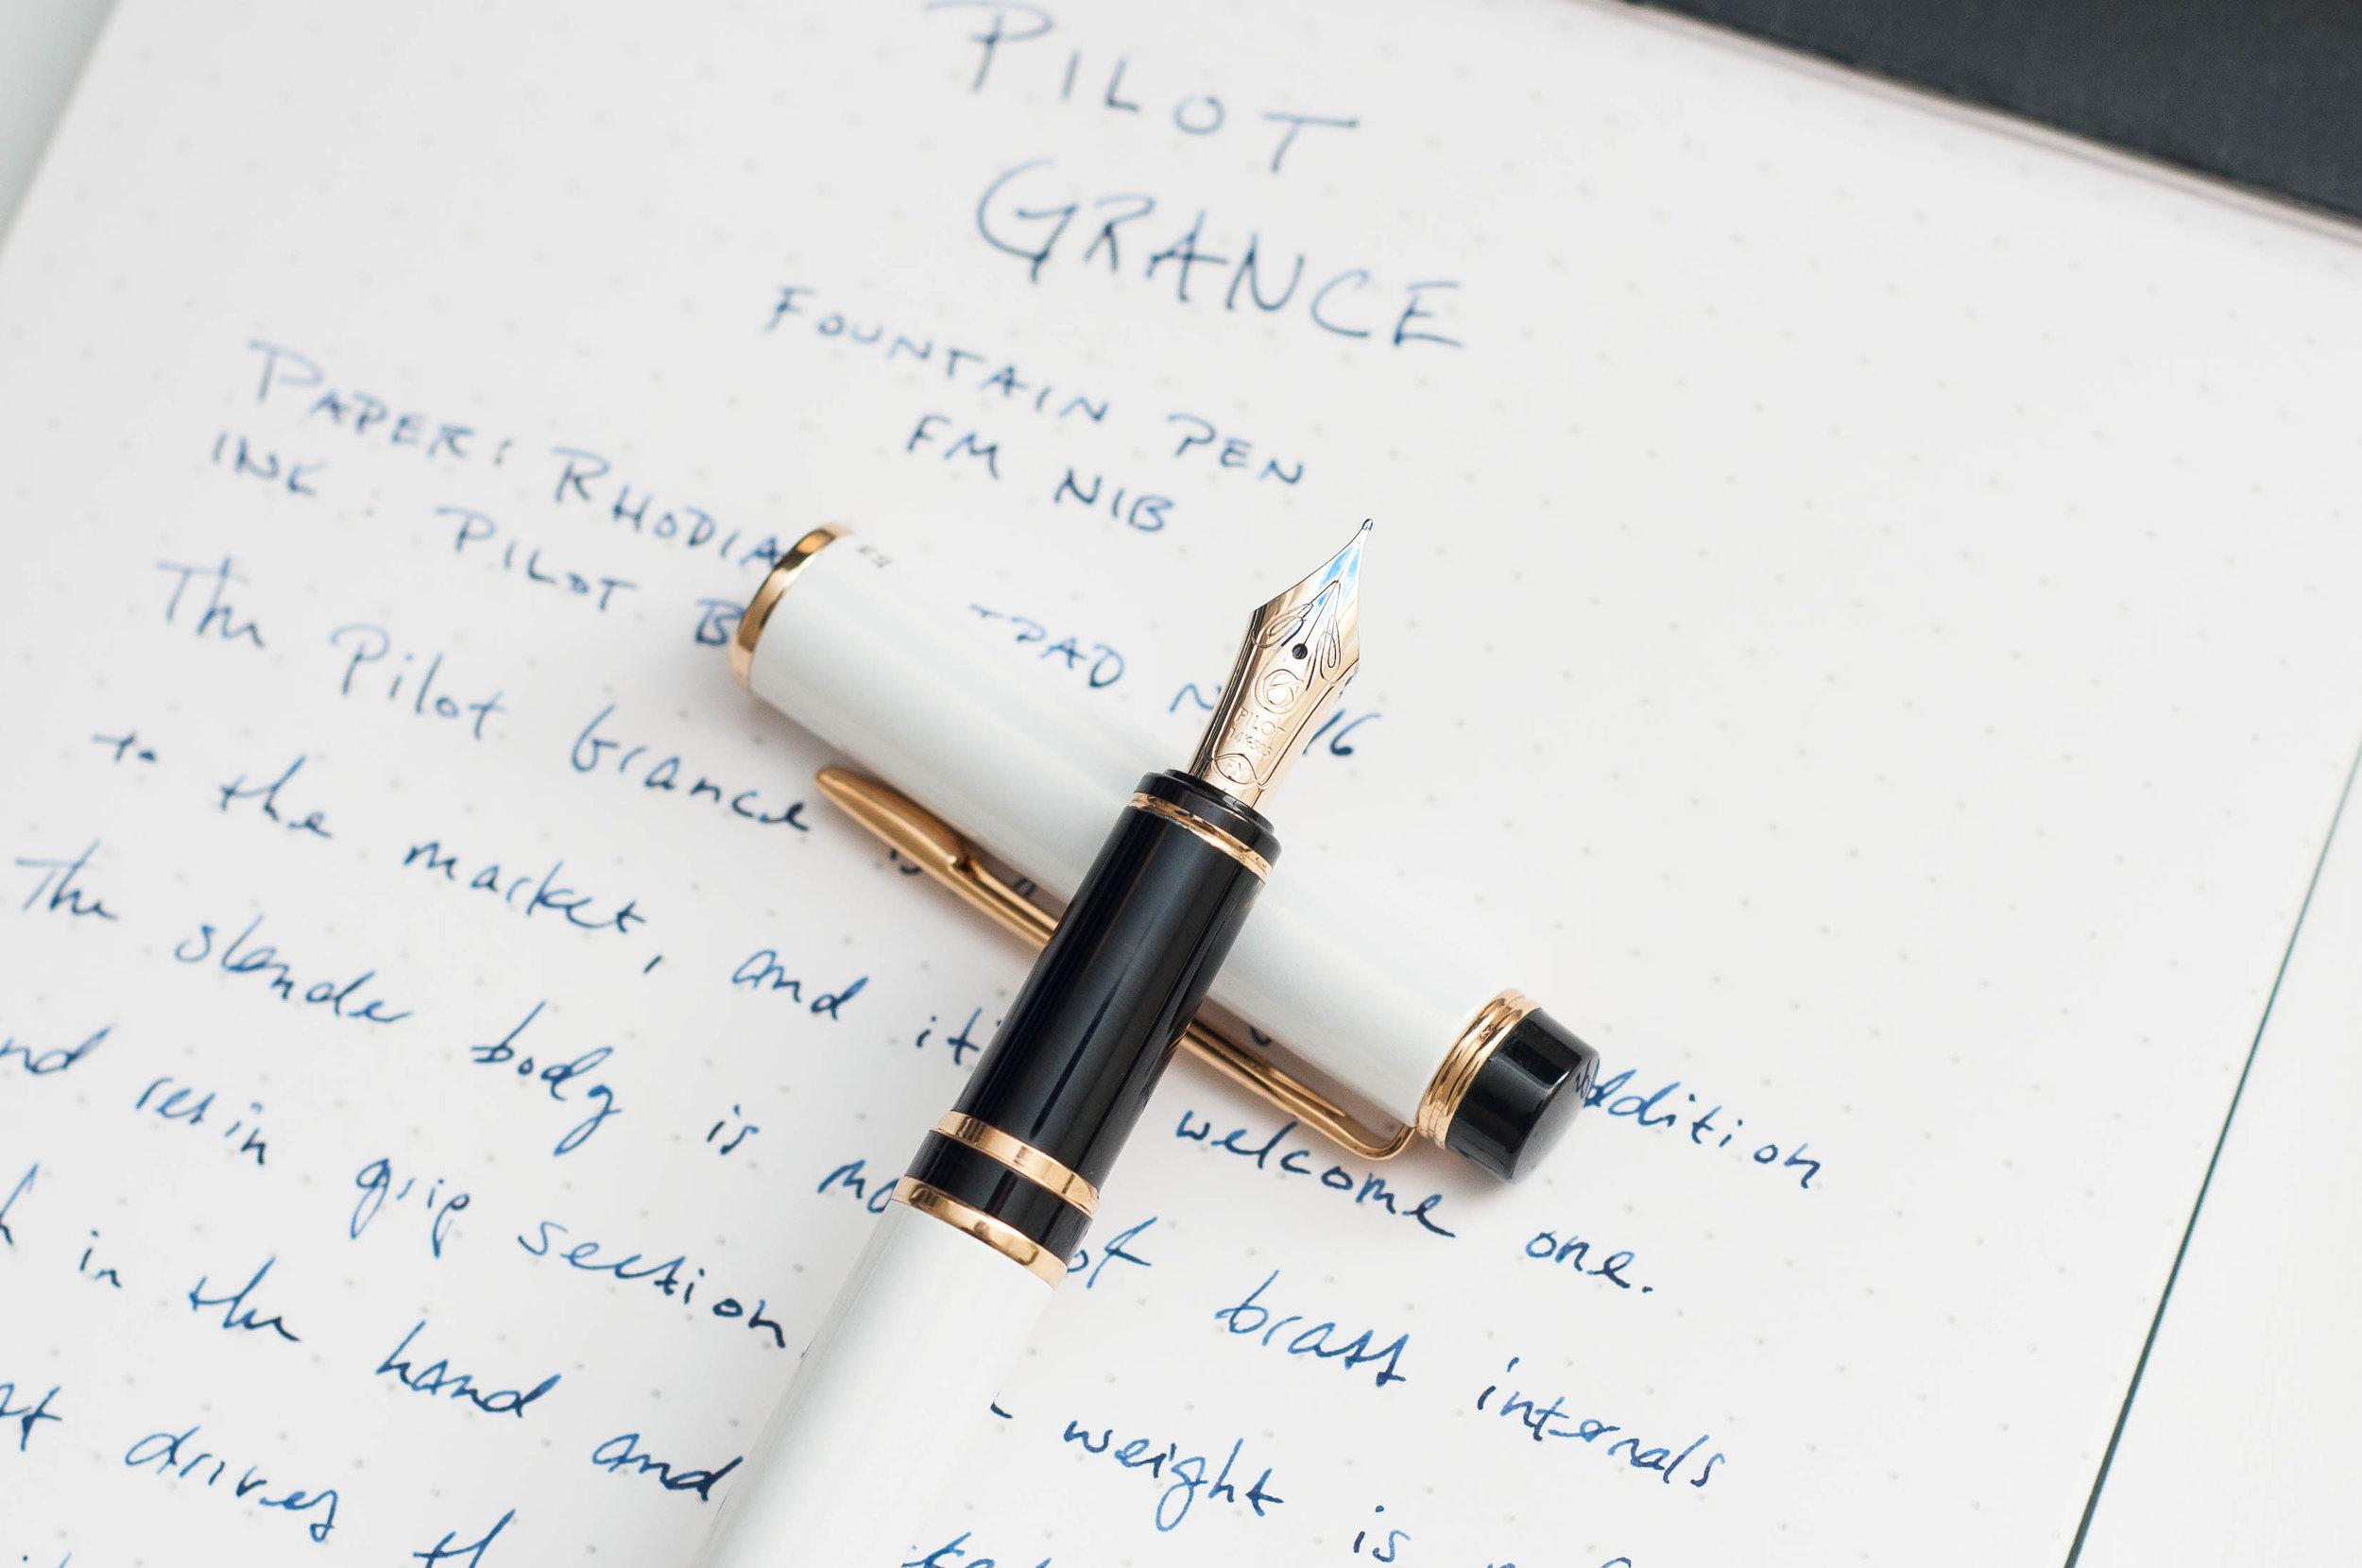 Pilot Grance Fountain Pen Section